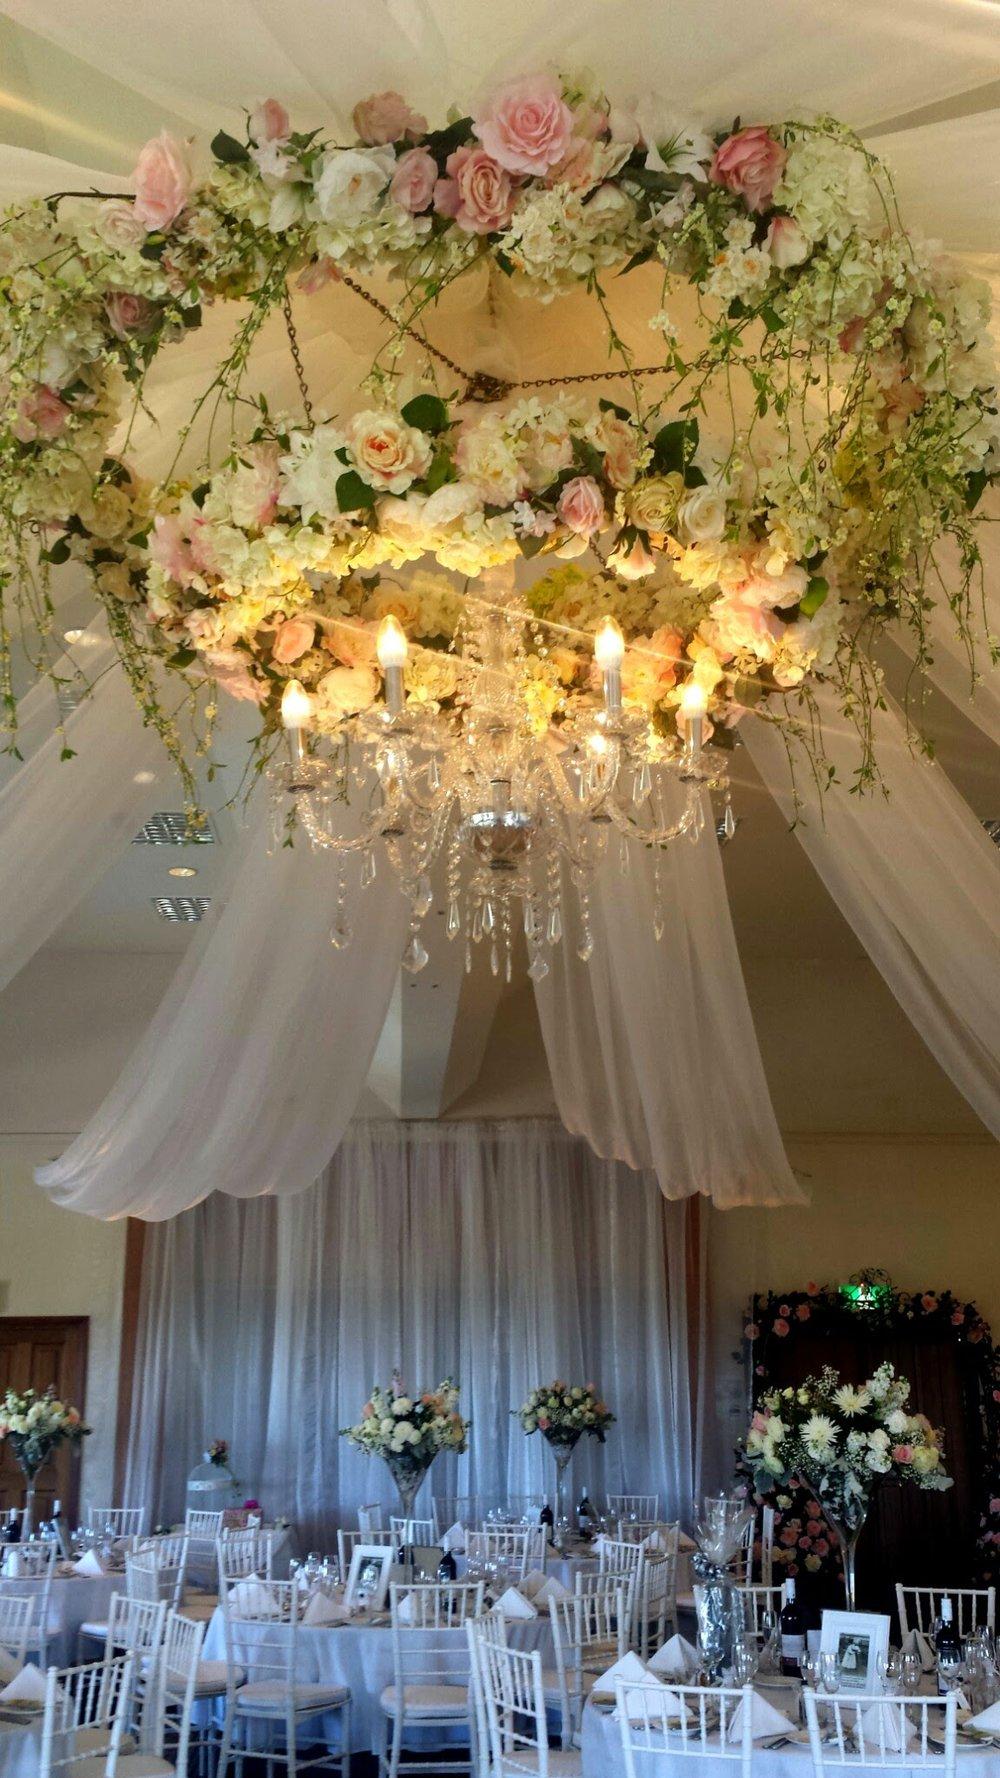 2014-10-04 16.15.06floral chandelier.jpg